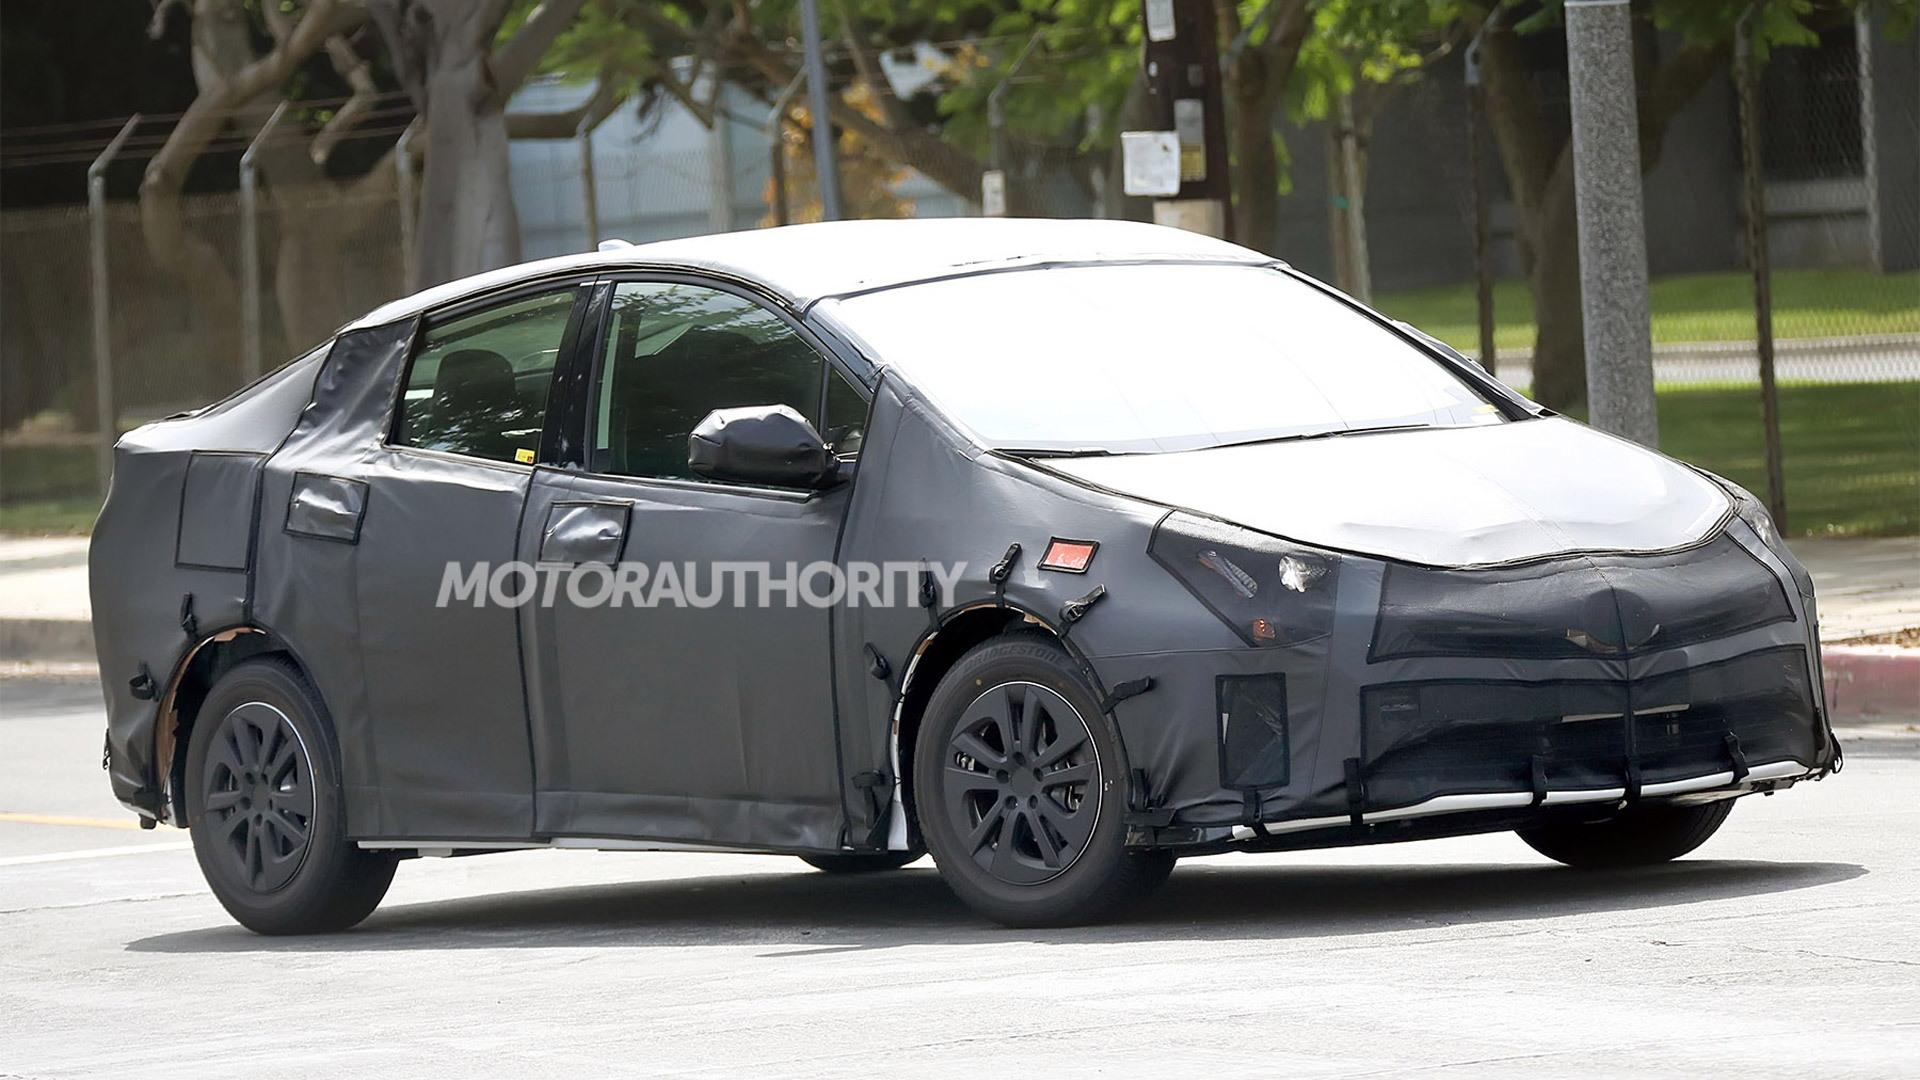 2020 Spy Shots Toyota Prius Prices